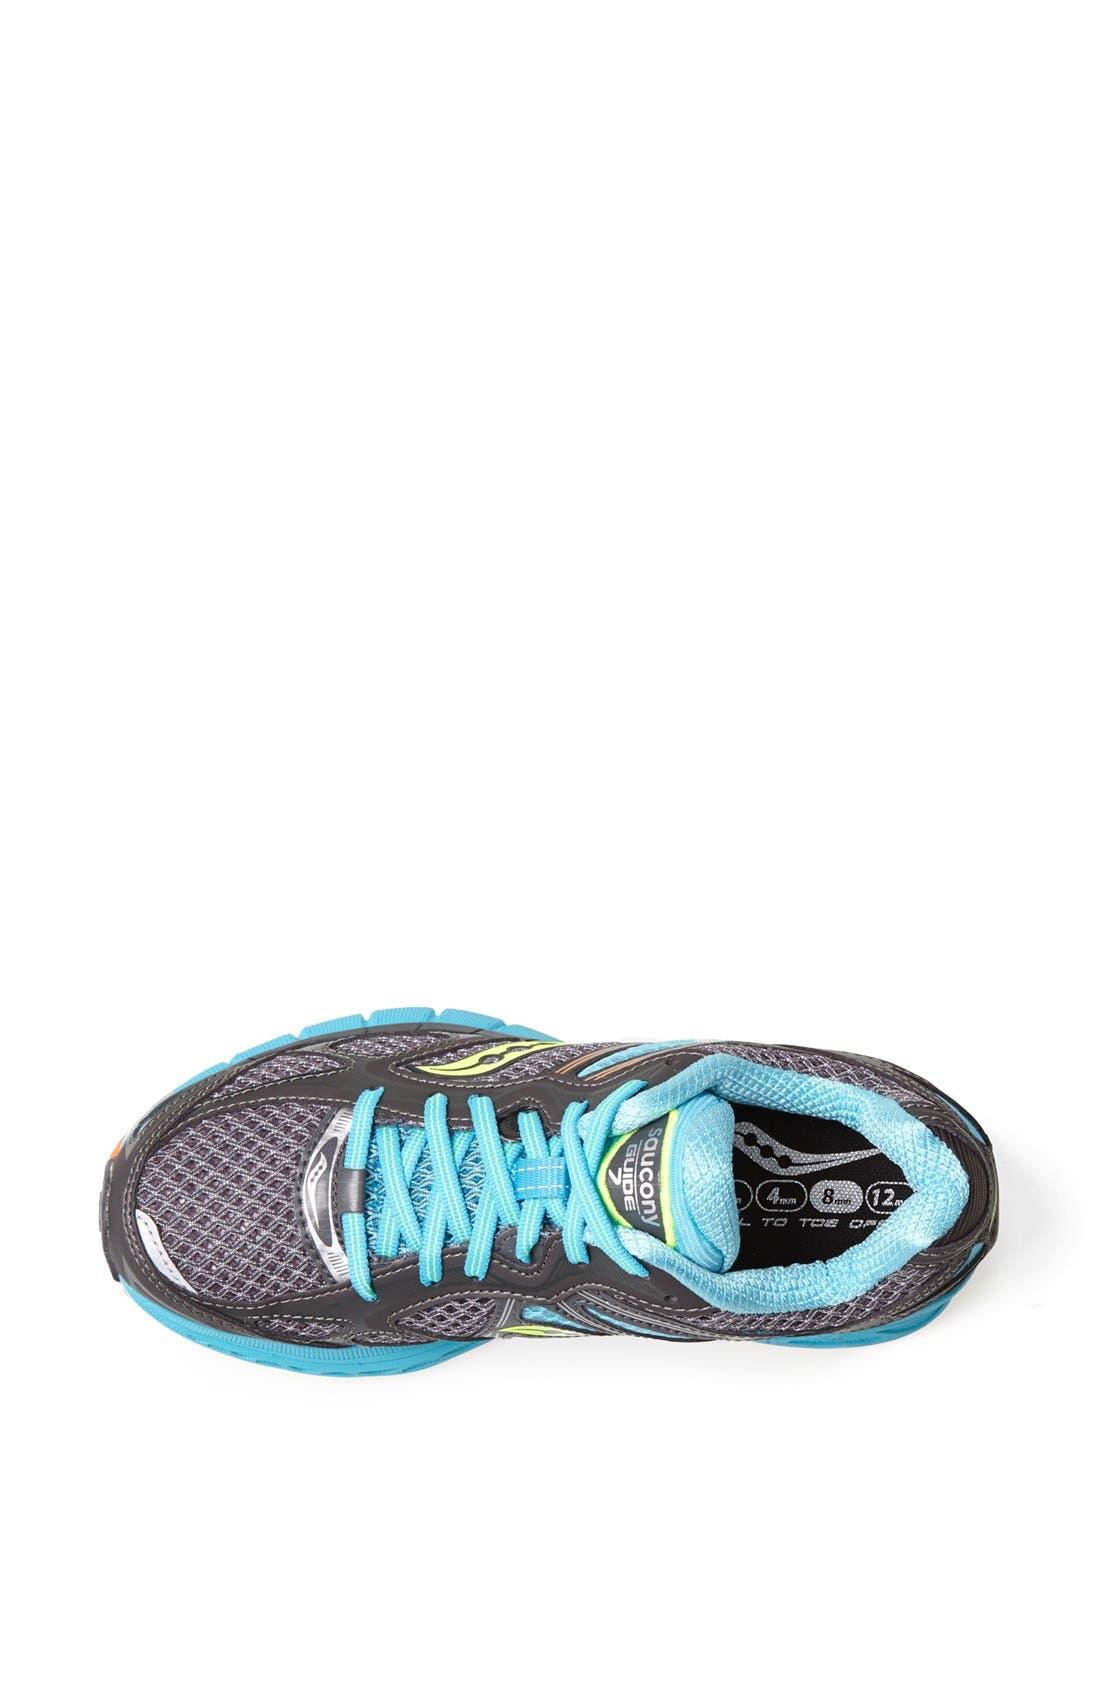 Alternate Image 3  - Saucony 'Guide 7' Running Shoe (Women)